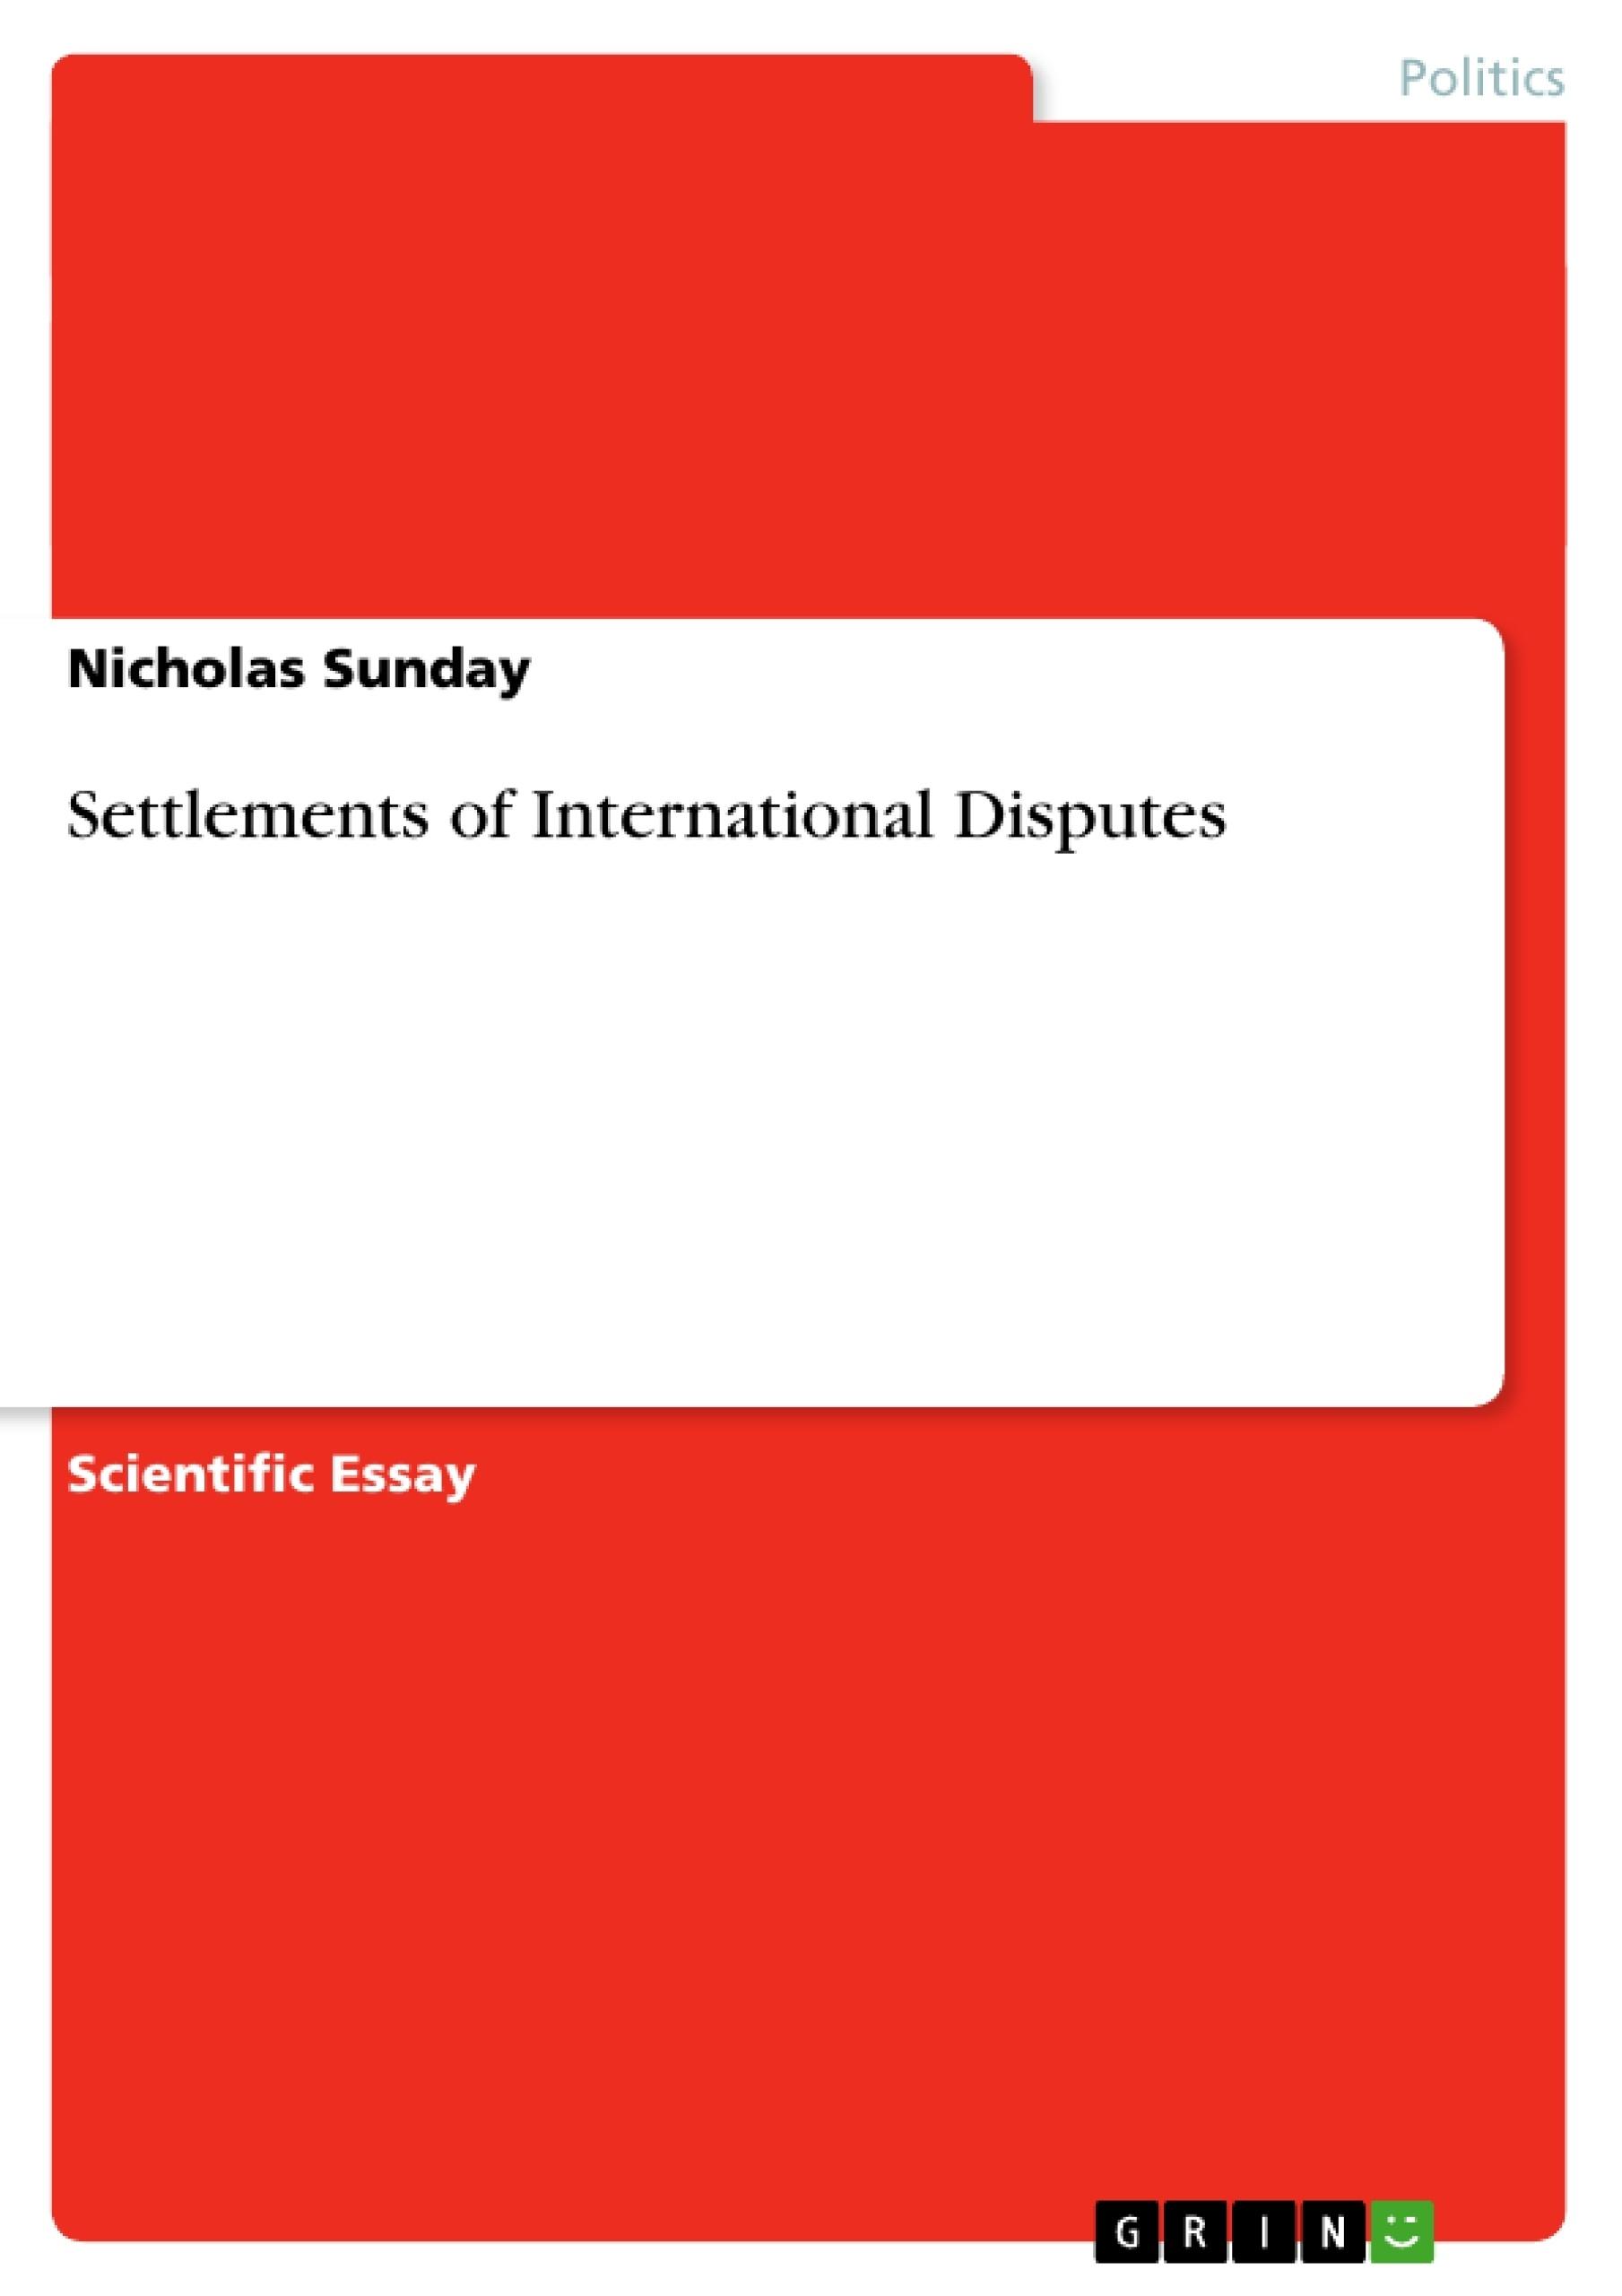 Title: Settlements of International Disputes